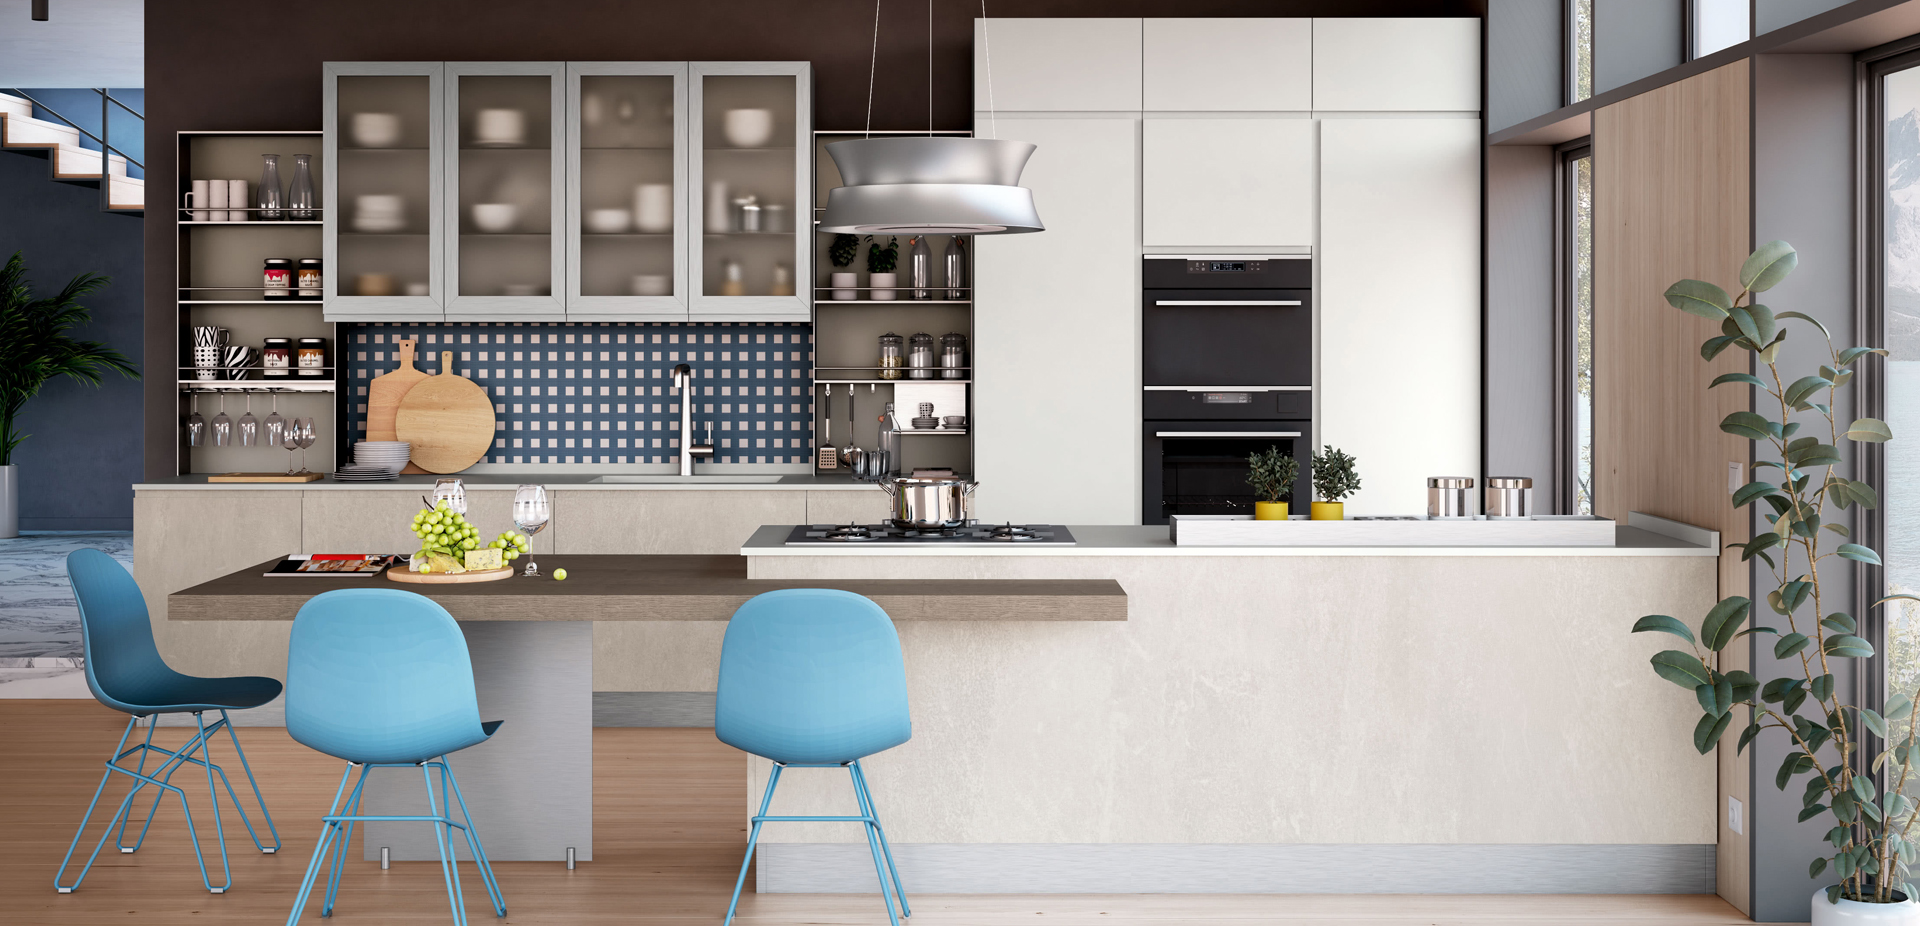 Jey Feel Creo Store Milano Showroom Cucine Creo Kitchens A Milano